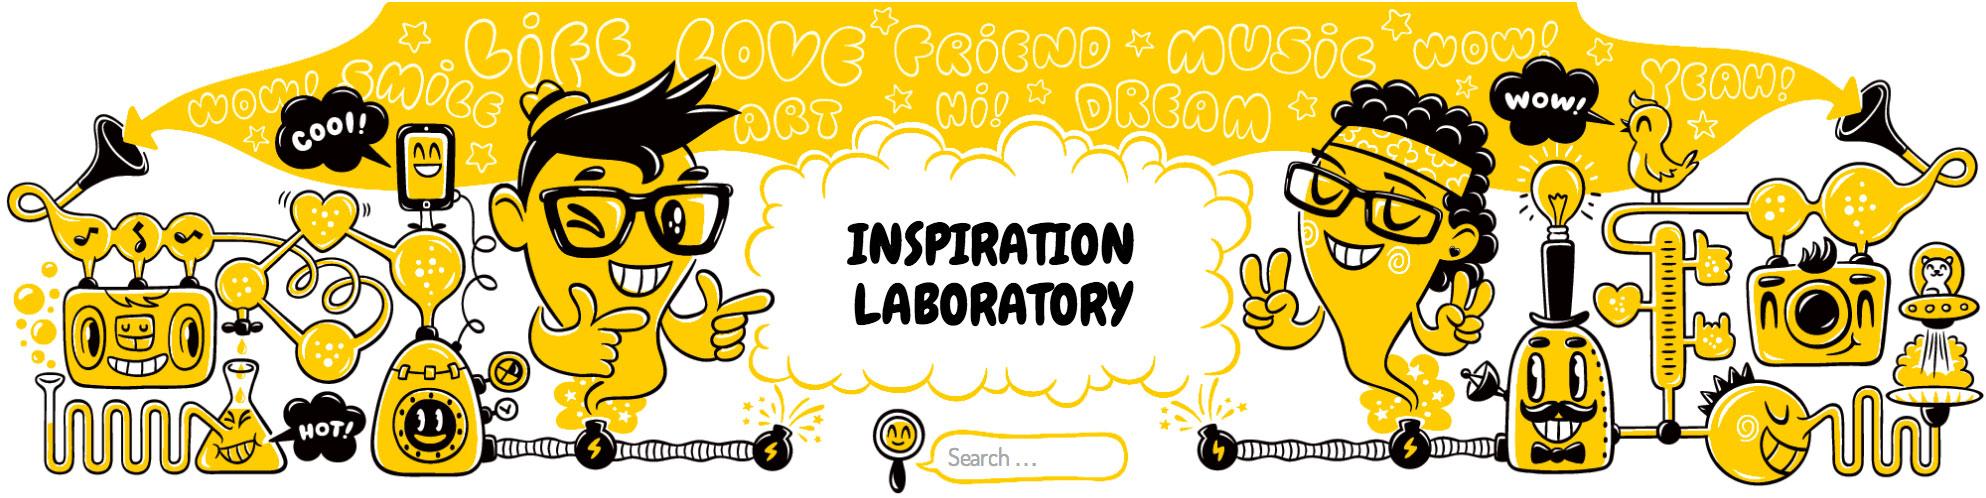 inspiration-laboratory-header-image